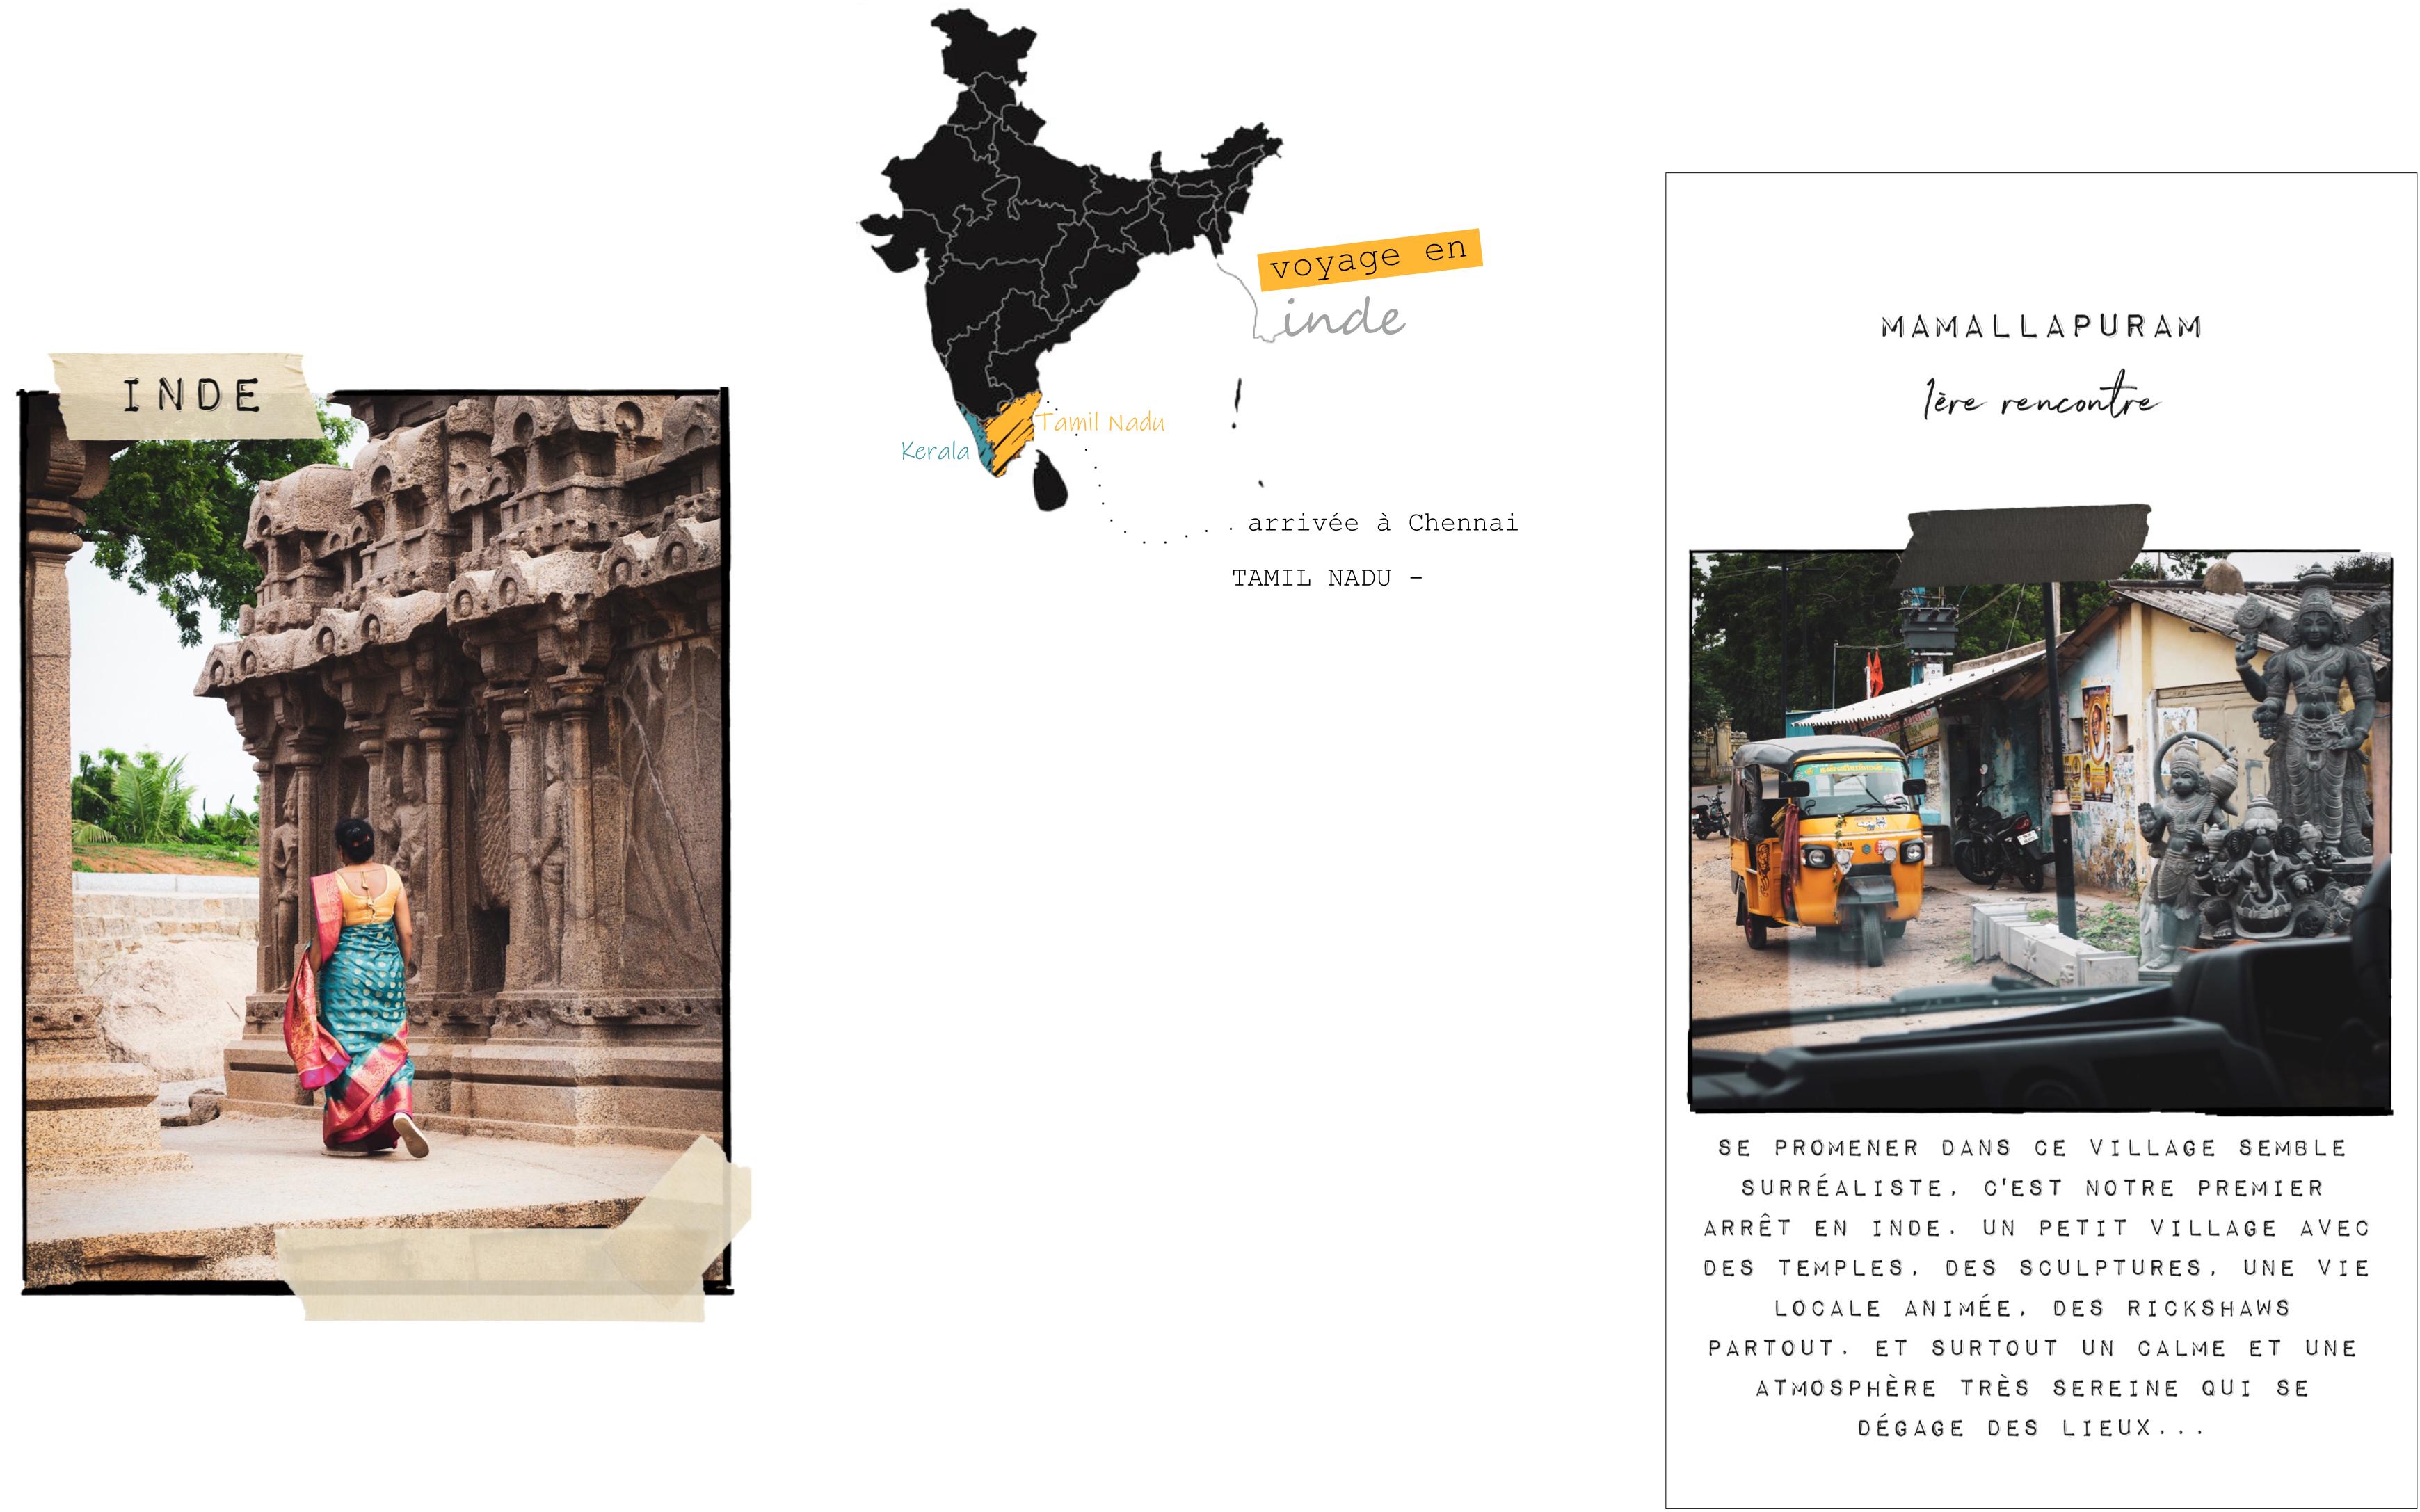 voyage au tamil nadu inde du sud - mamallapuram - carnet voyage kerala - Tamil Nadu